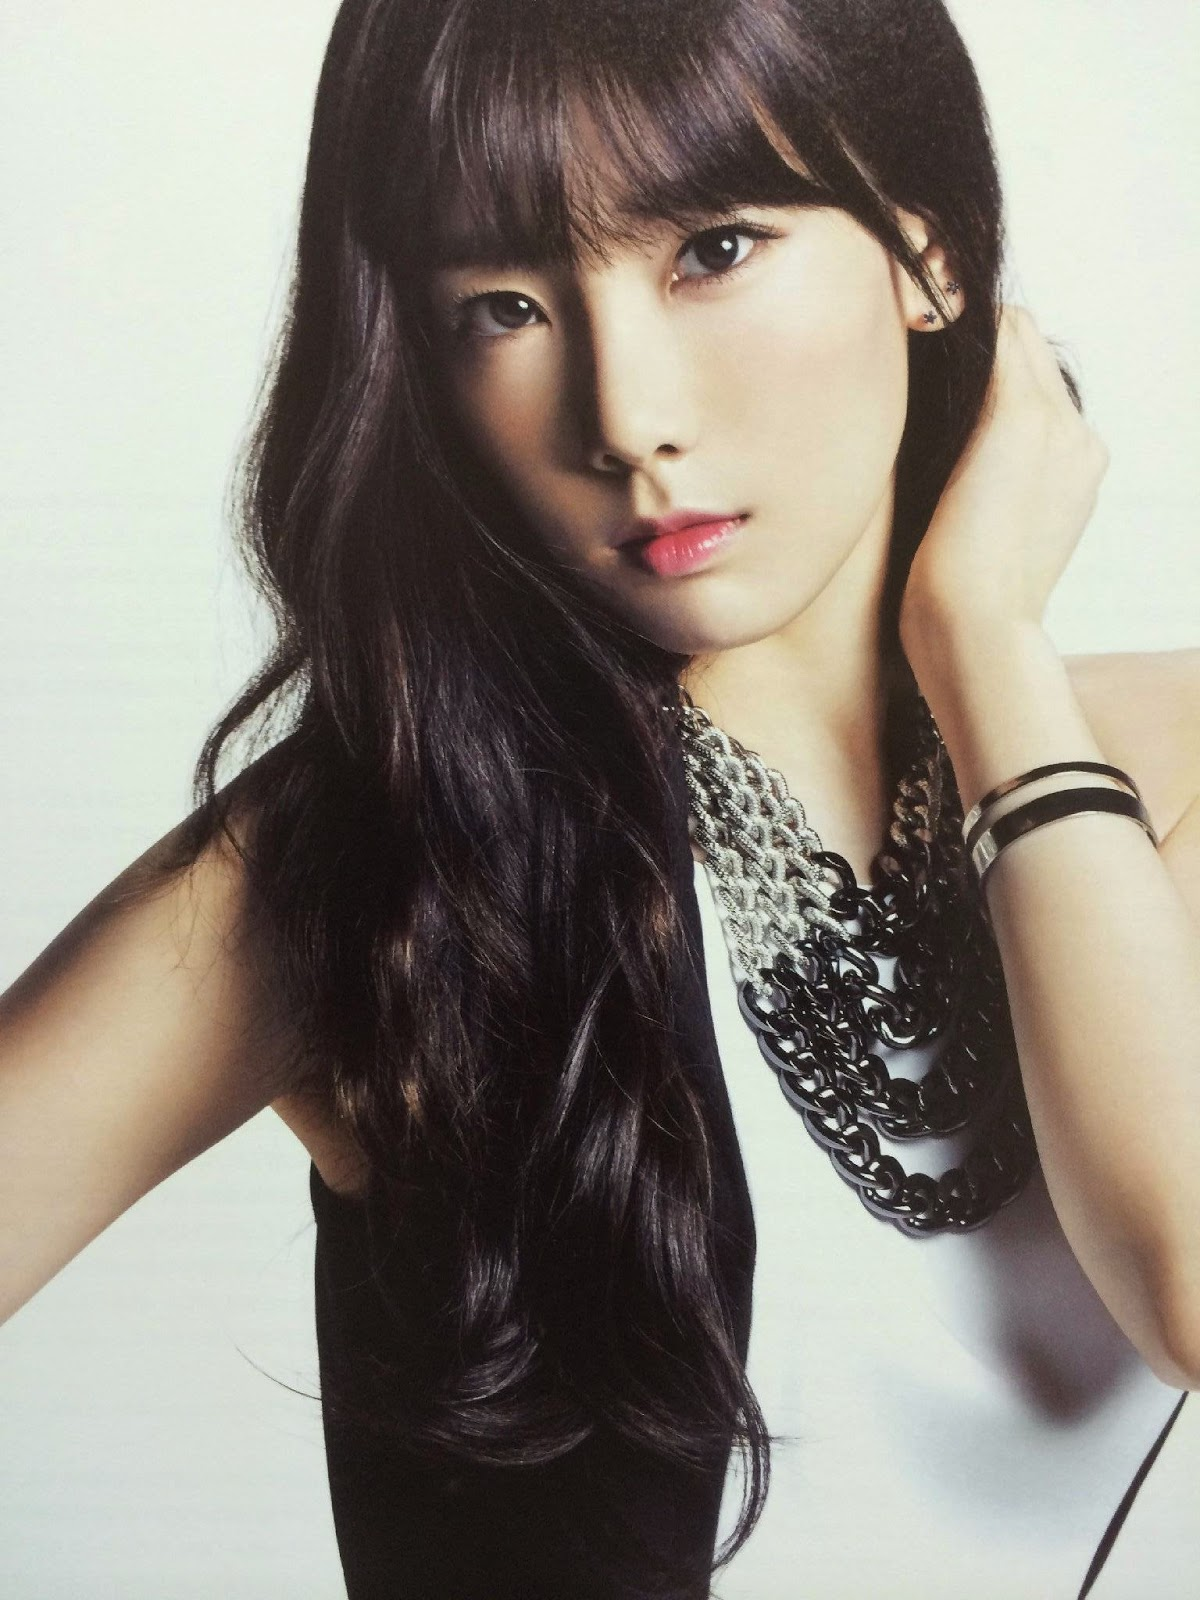 SNSD Taeyeon (태연; テヨン) Girls Generation The Best Scan Photos